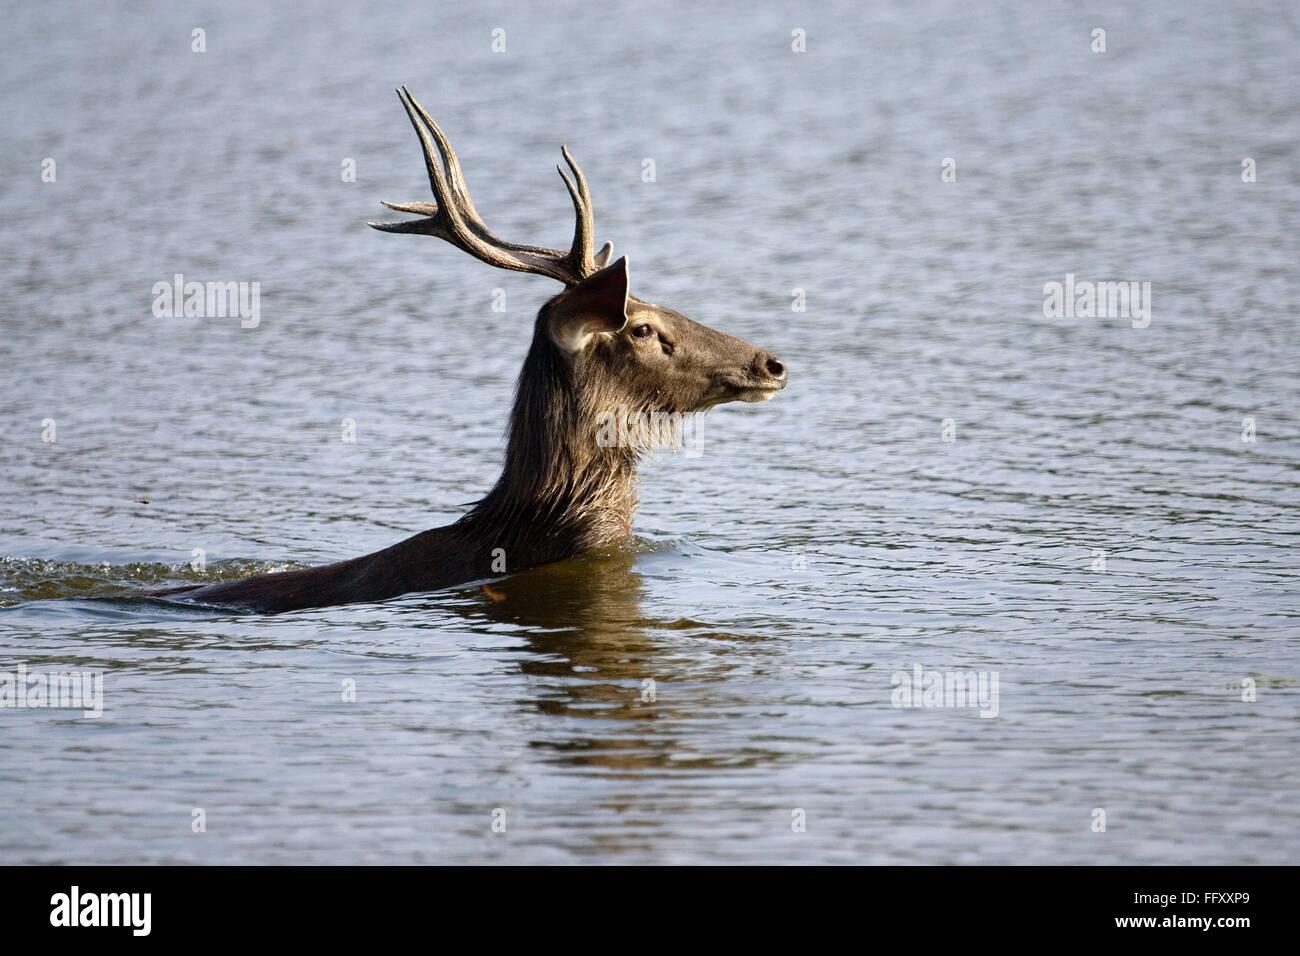 Sambar deer stag Cervus unicolor swimming in water , Ranthambore tiger reserve , Rajasthan , India - Stock Image